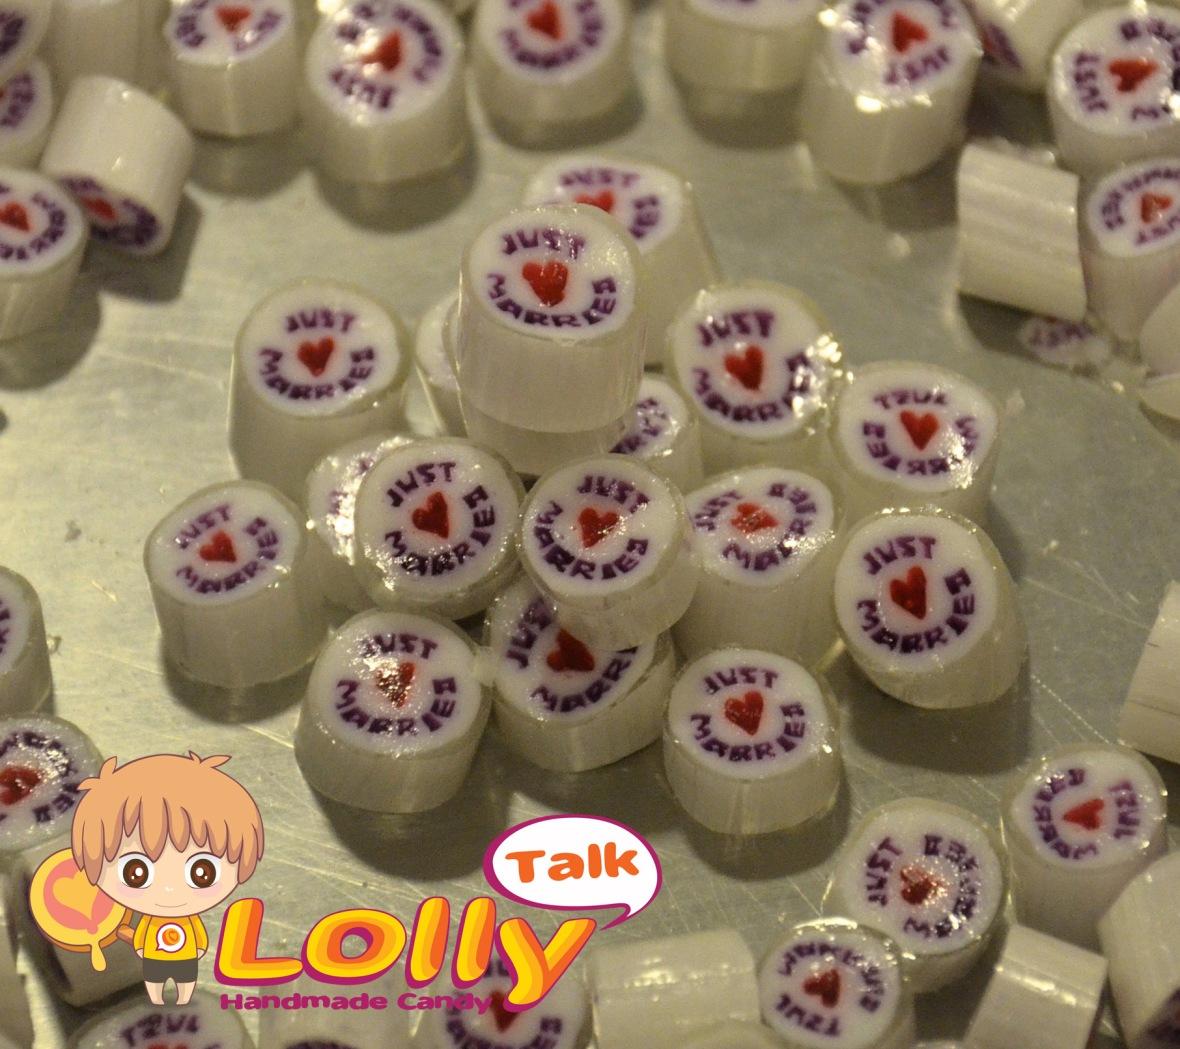 LollyTalk's customised wedding candy